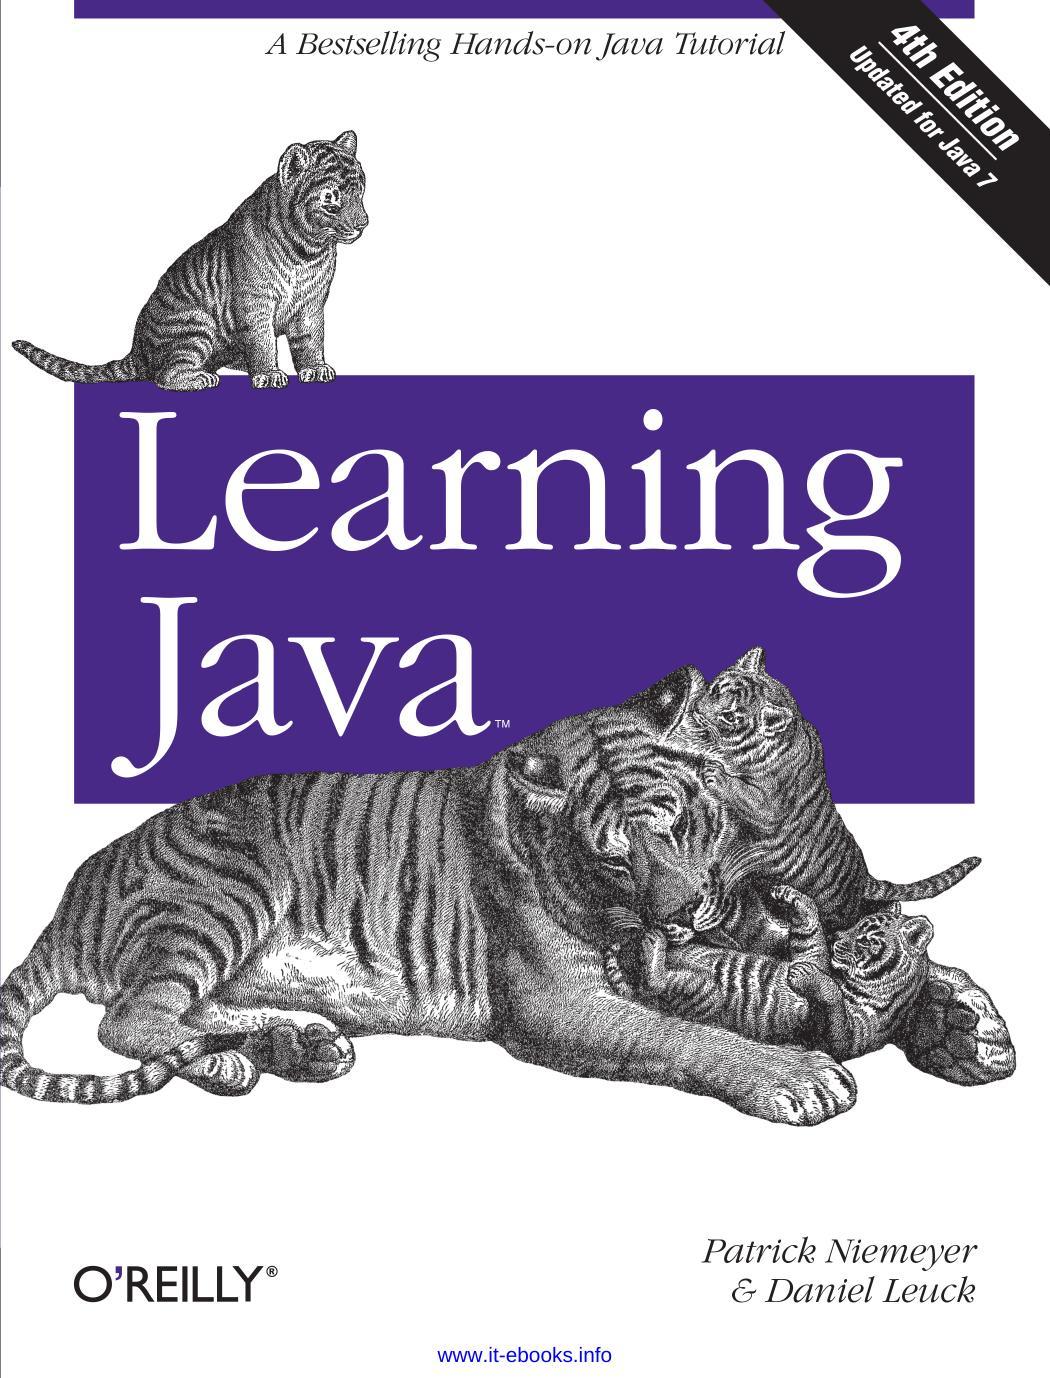 Learning Java by Patrick Niemeyer & Daniel Leuck